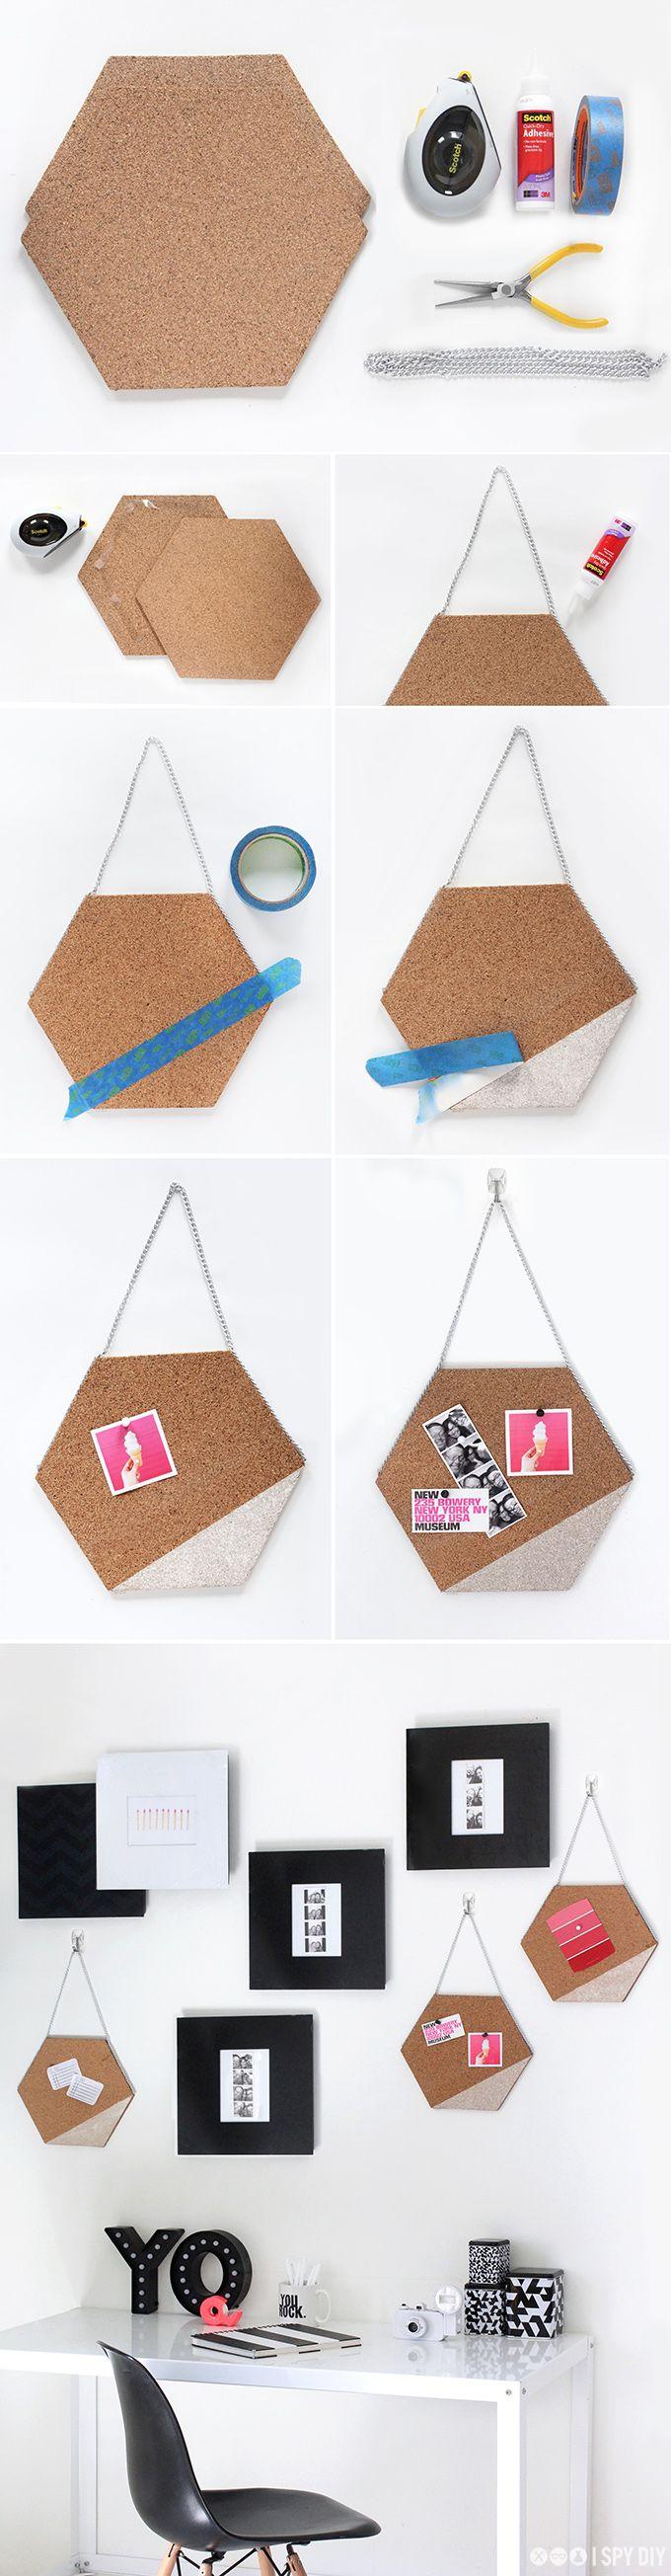 MY DIY Hexagon Cork Memo Board